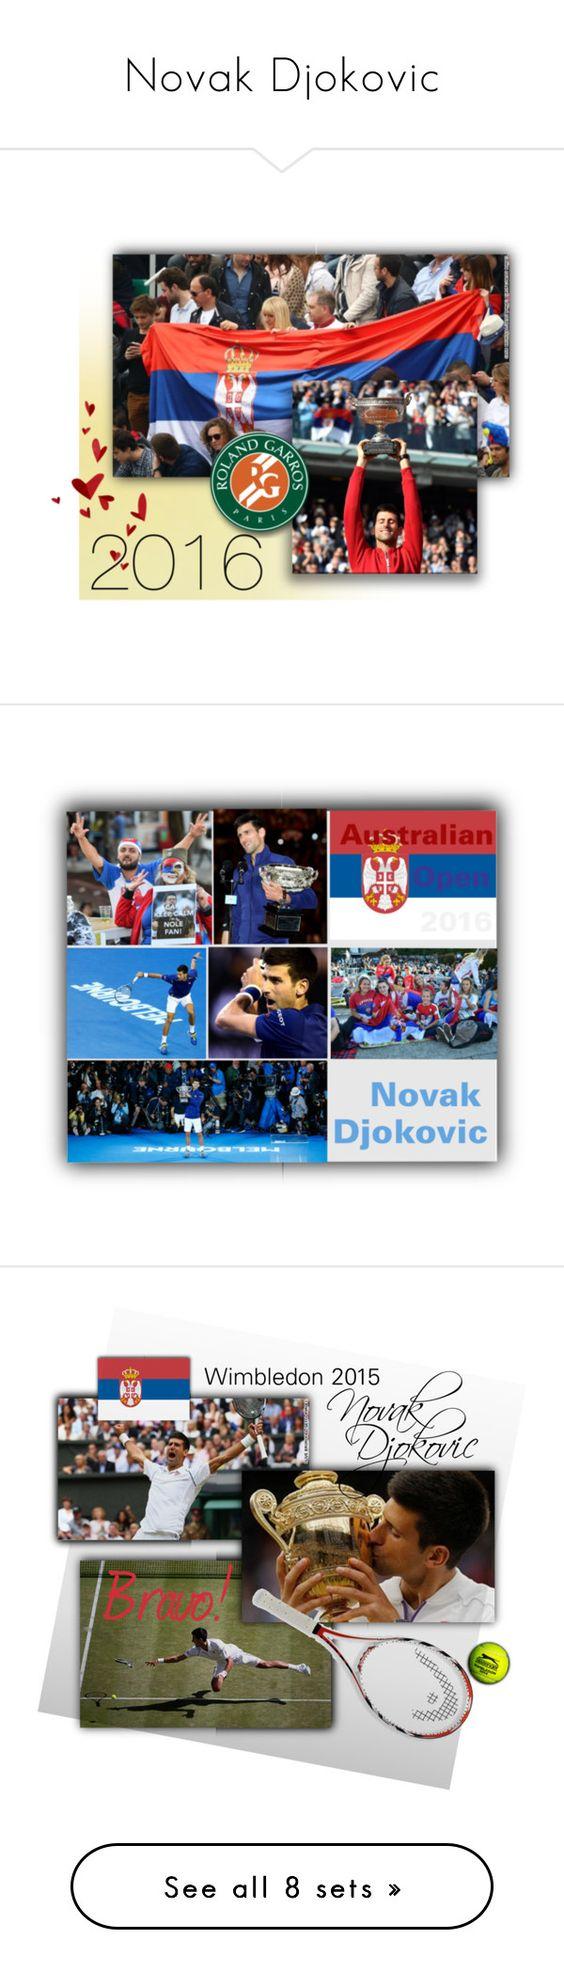 """Novak Djokovic"" by ysmn-pan ❤ liked on Polyvore featuring art, winner, wimbledon, 2015, NovakDjokovic and 211"